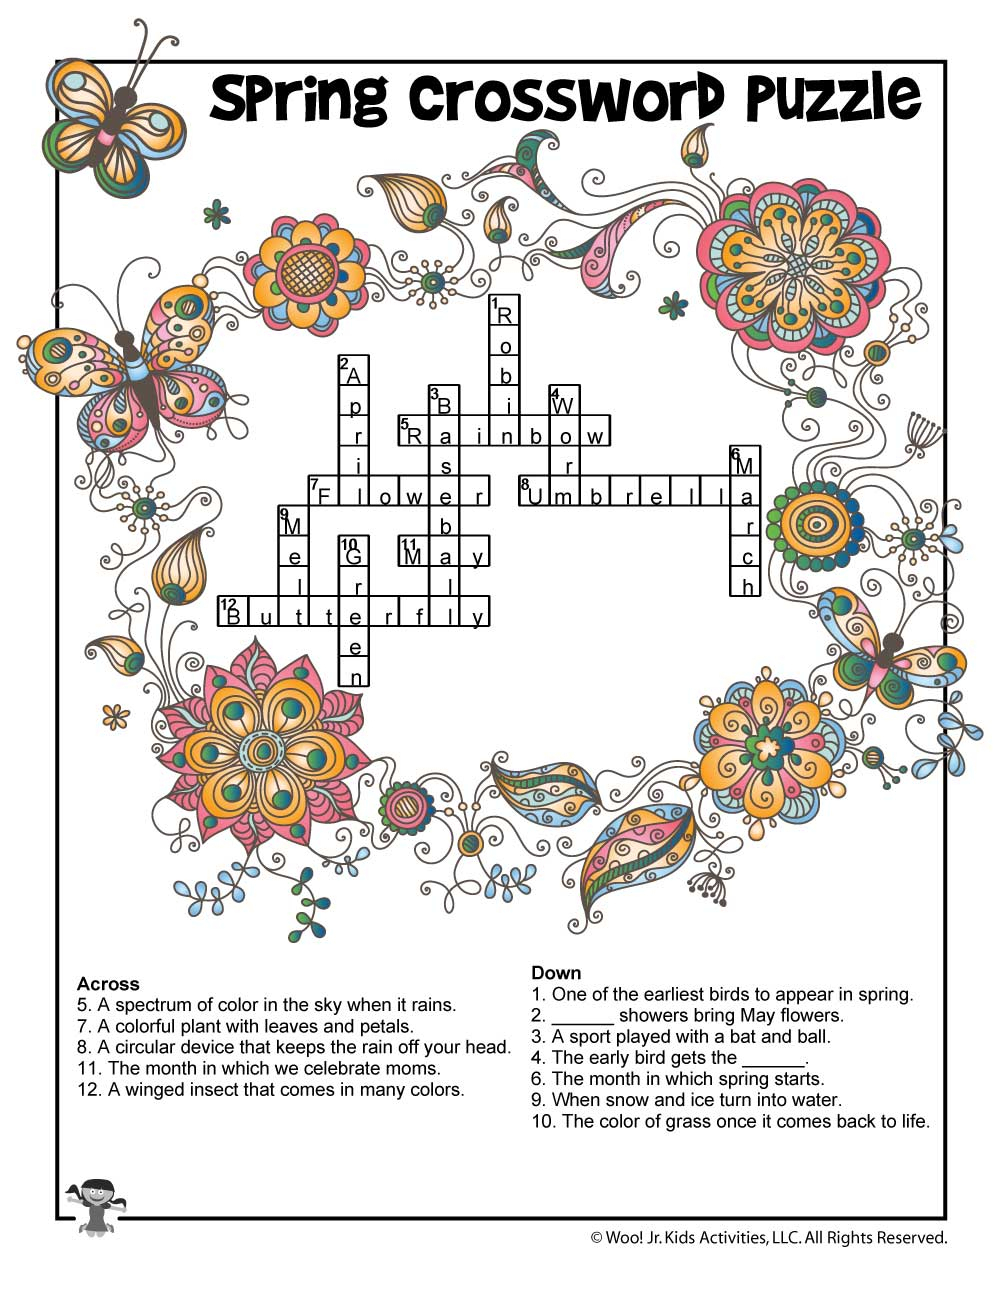 Spring Crossword Puzzle For Kids - Answer Key   Woo! Jr. Kids Activities - Printable Crossword Spring